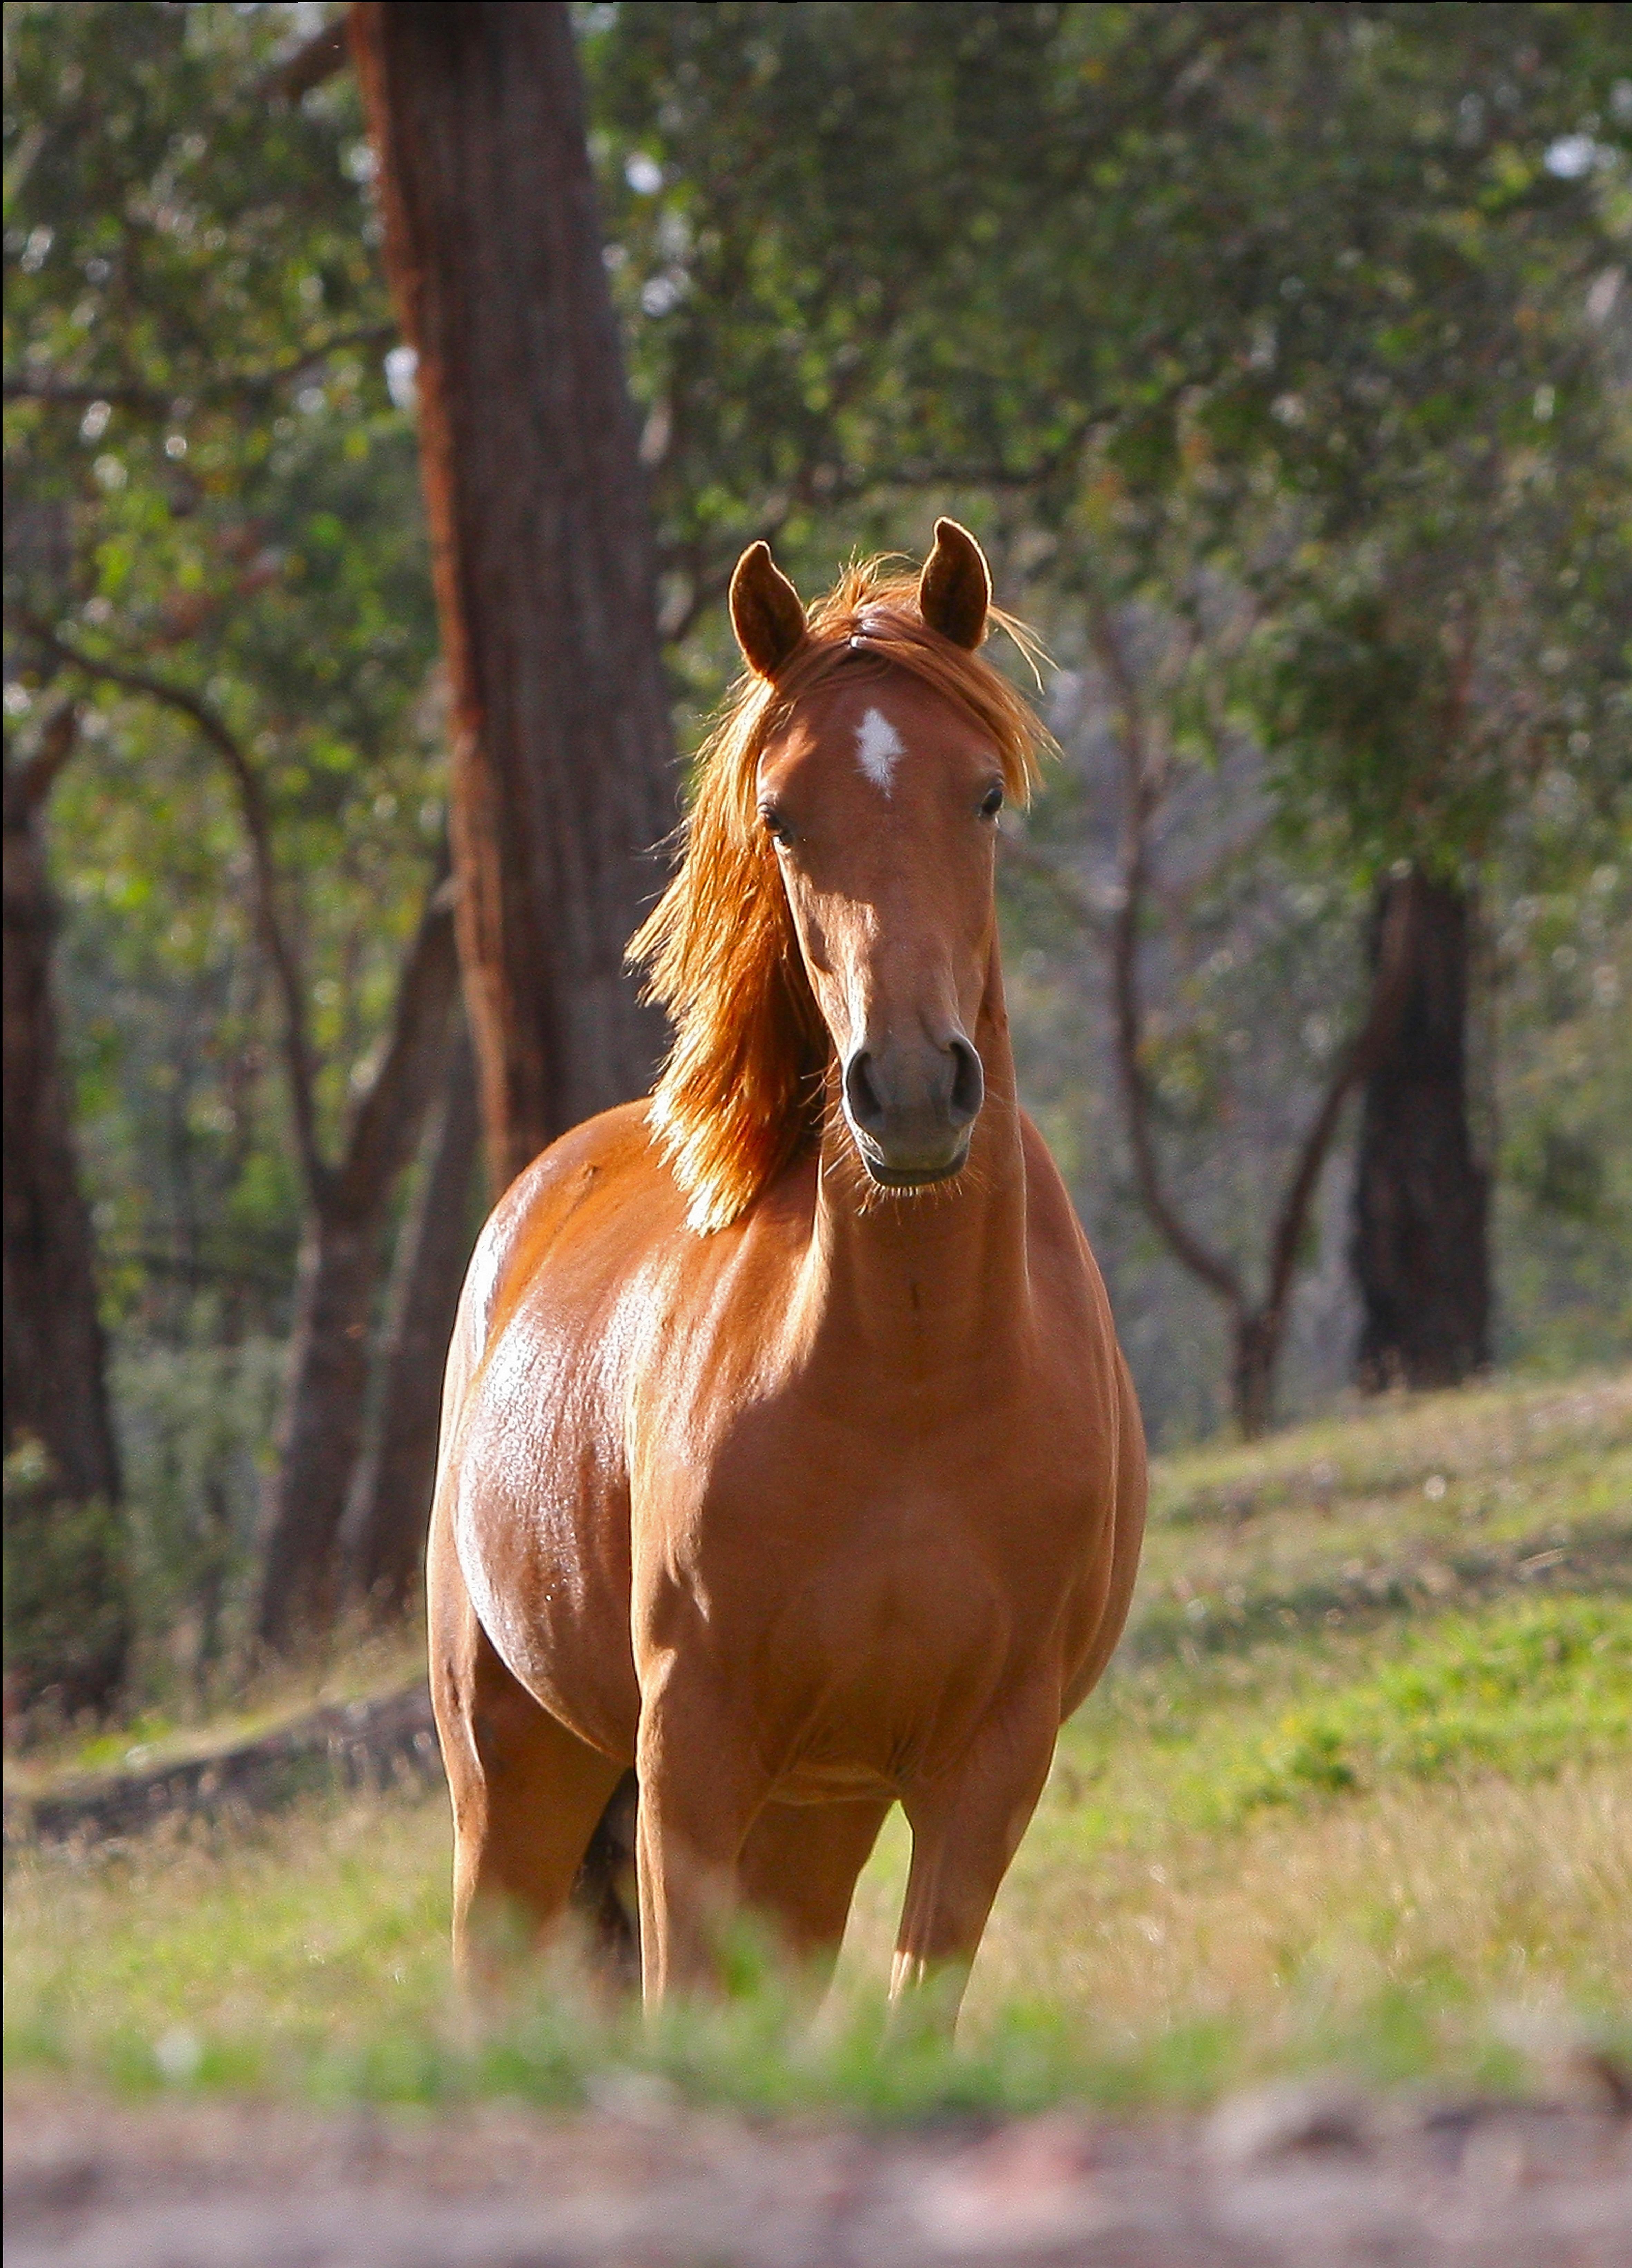 Gambar Tanah Pertanian Padang Rumput Hewan Margasatwa Penggembalaan Binatang Menyusui Kuda Jantan Rambut Kuda Fauna Australia Pony Bertulang Belakang Kuda Betina Anak Kuda Stella Kuda Jantan Muda Kuda Seperti Mamalia Mustang